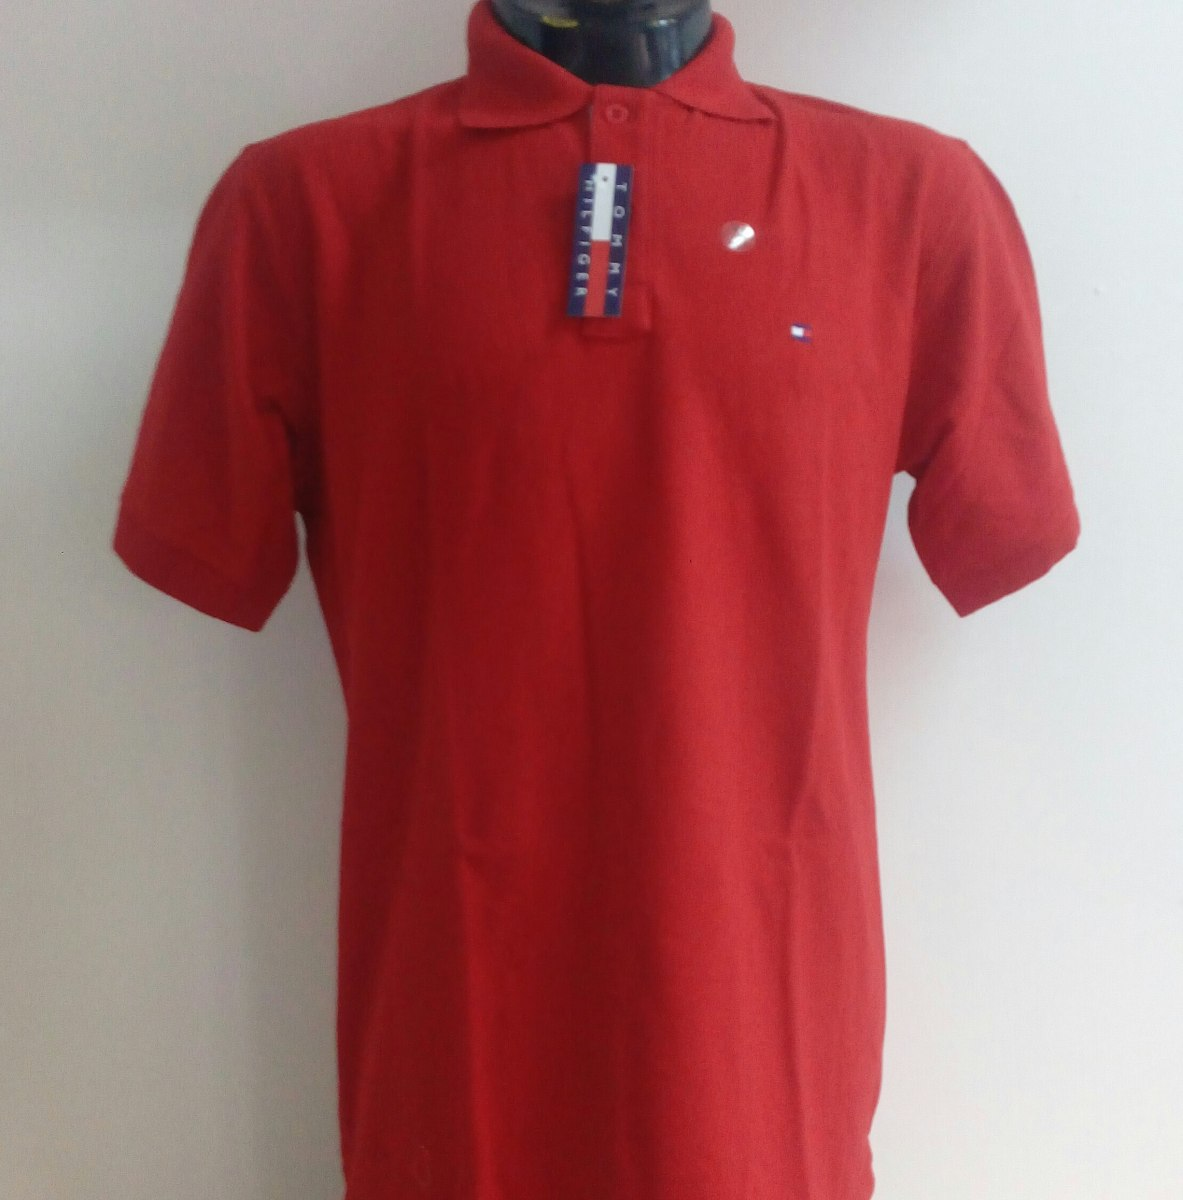 b90d80b18a3cc camisa playera polo tommy hilfiger color rojo quemado hombre. Cargando zoom.